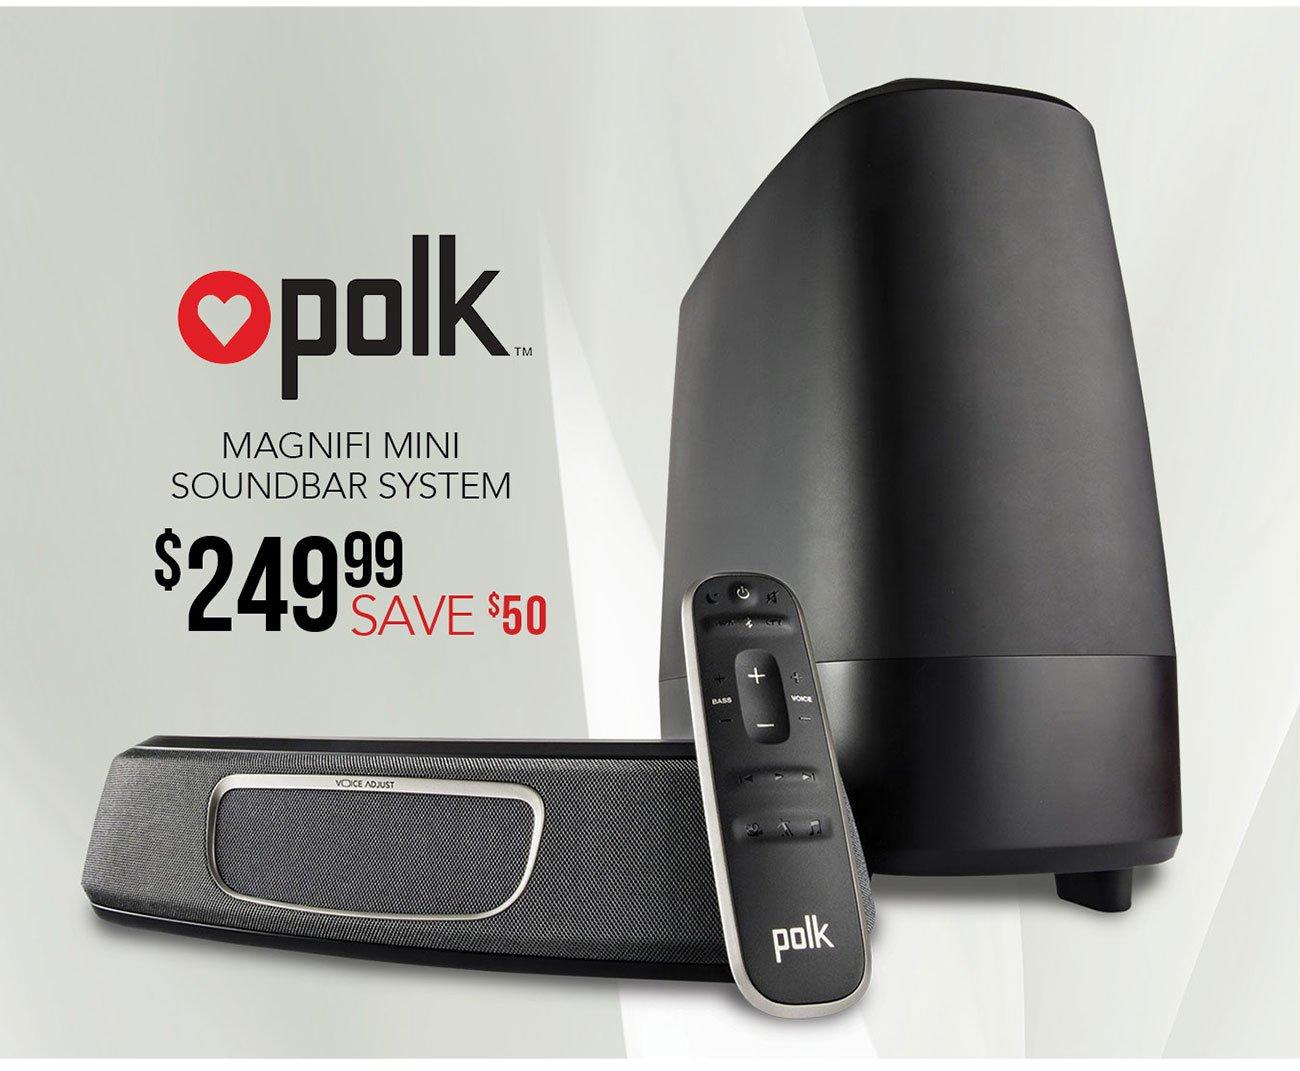 Polk-magnifi-soundbar